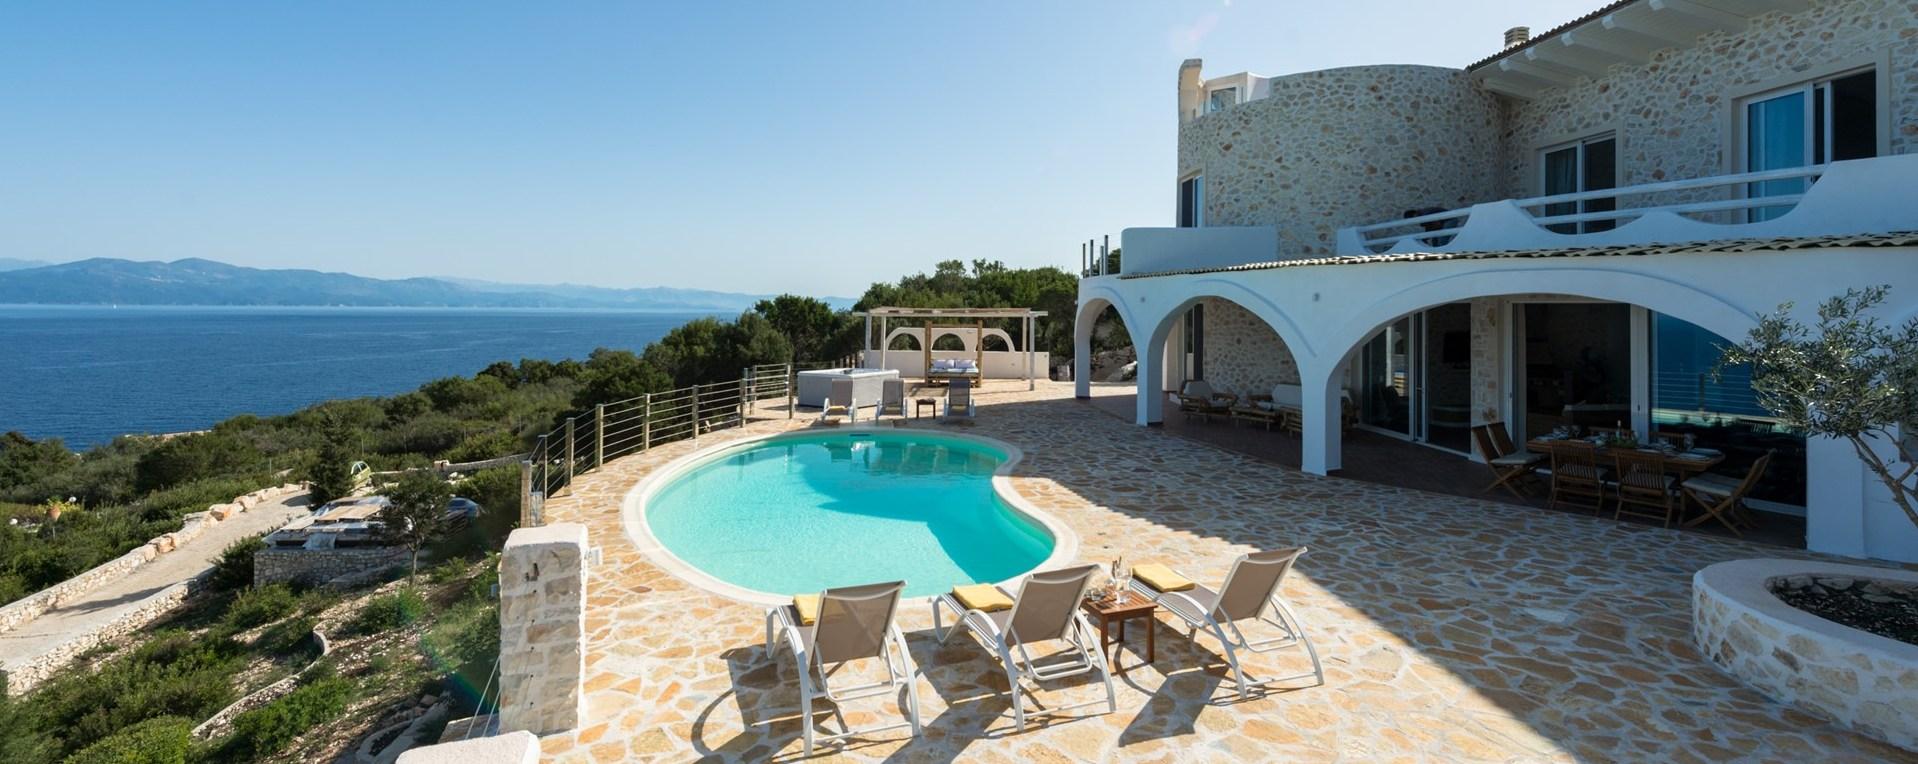 6-bed-family-pool-villa-paxos